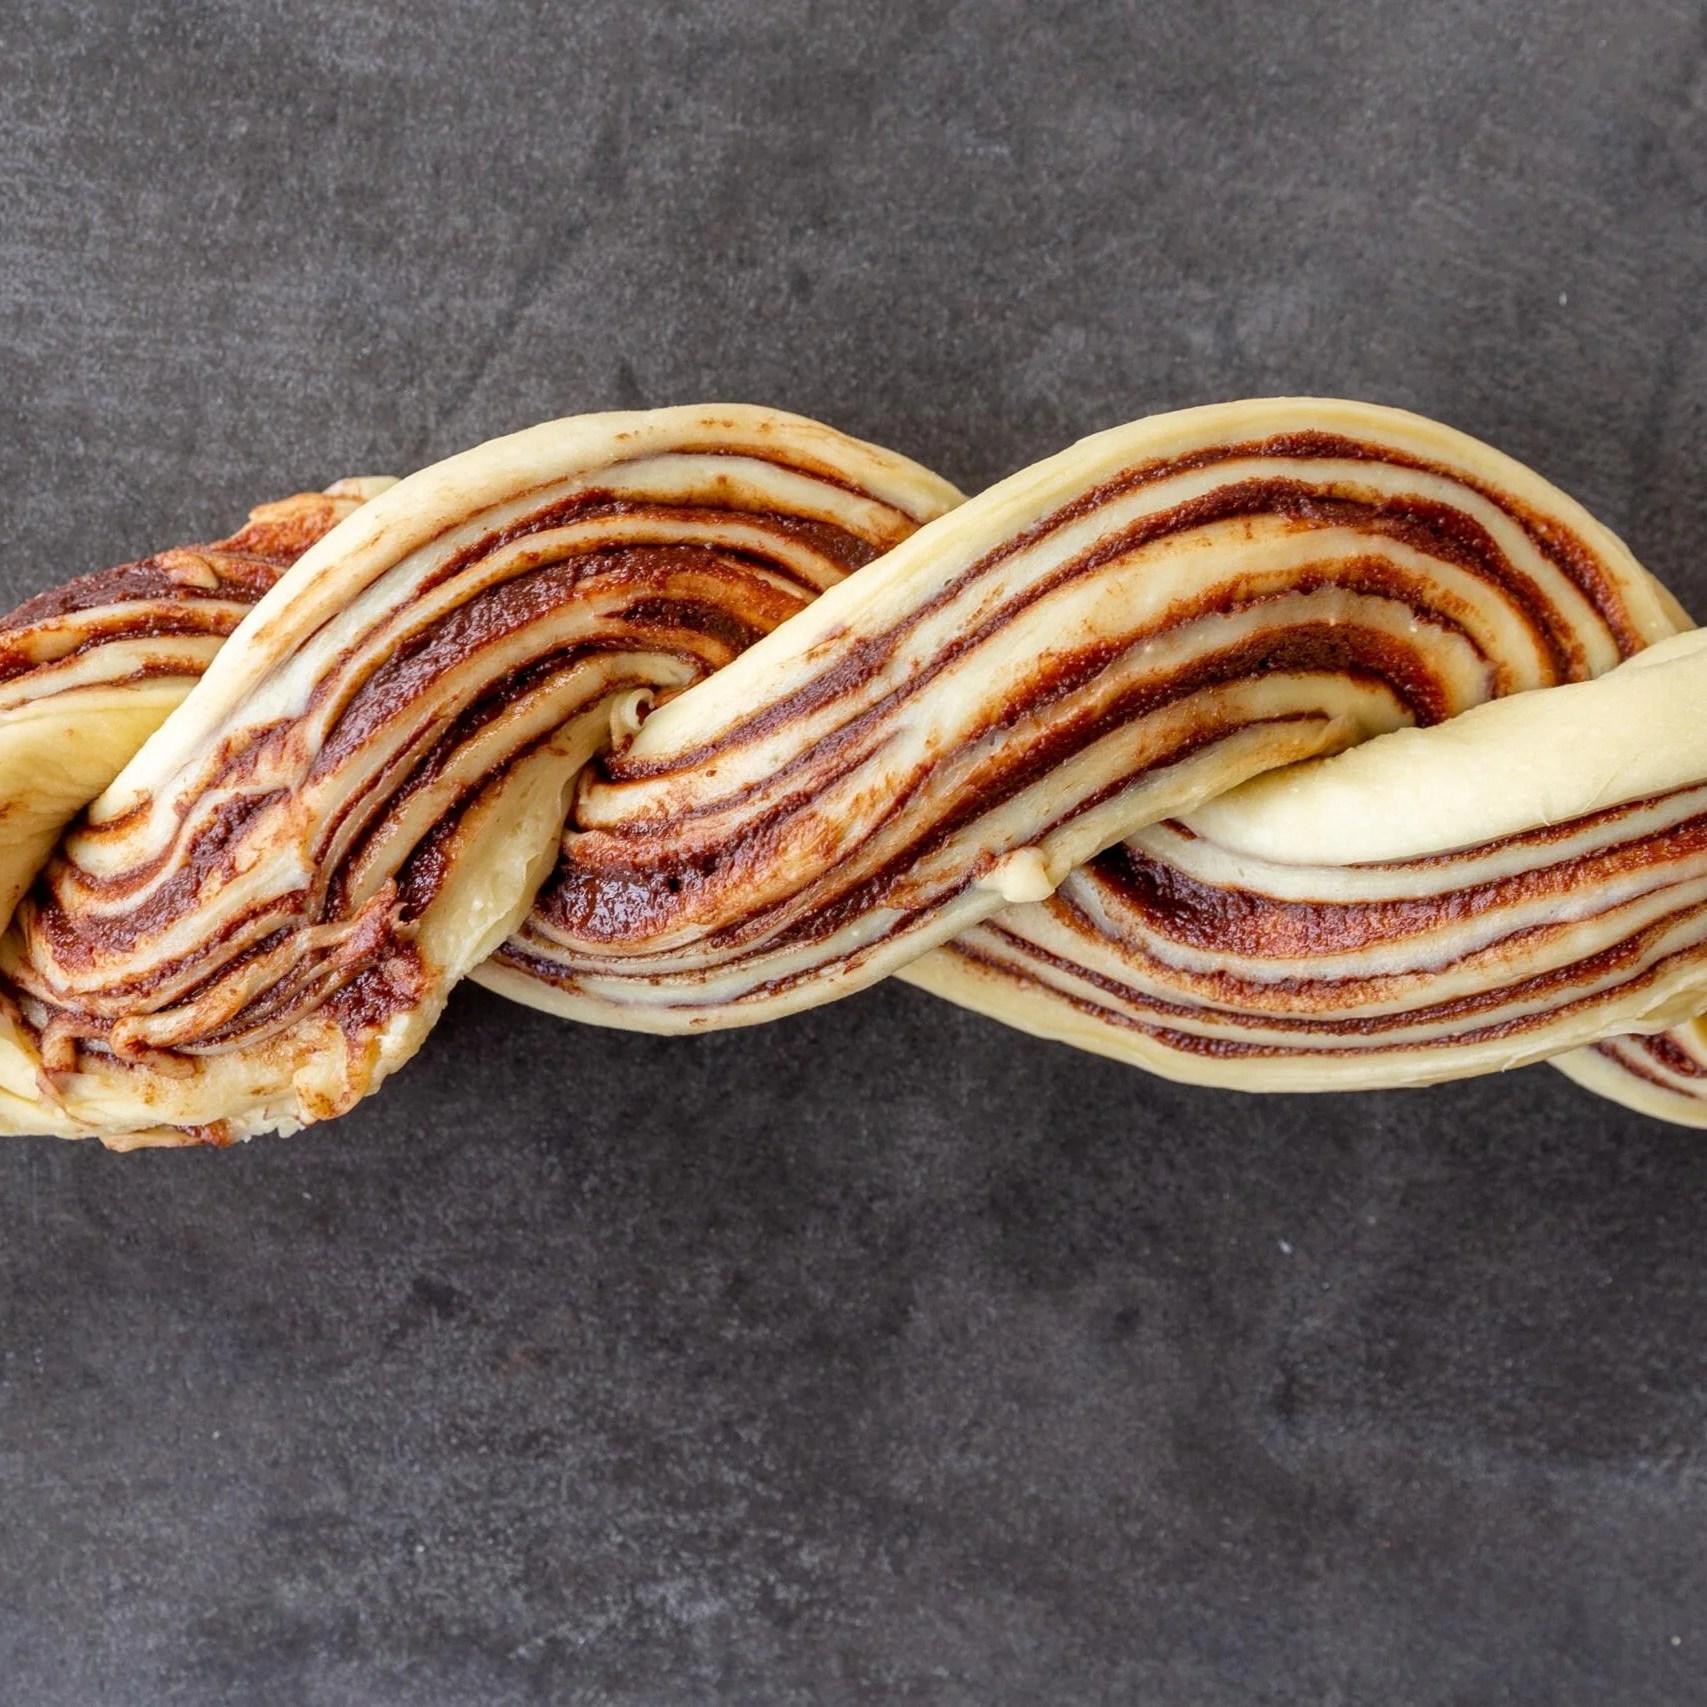 babka formed out of the dough